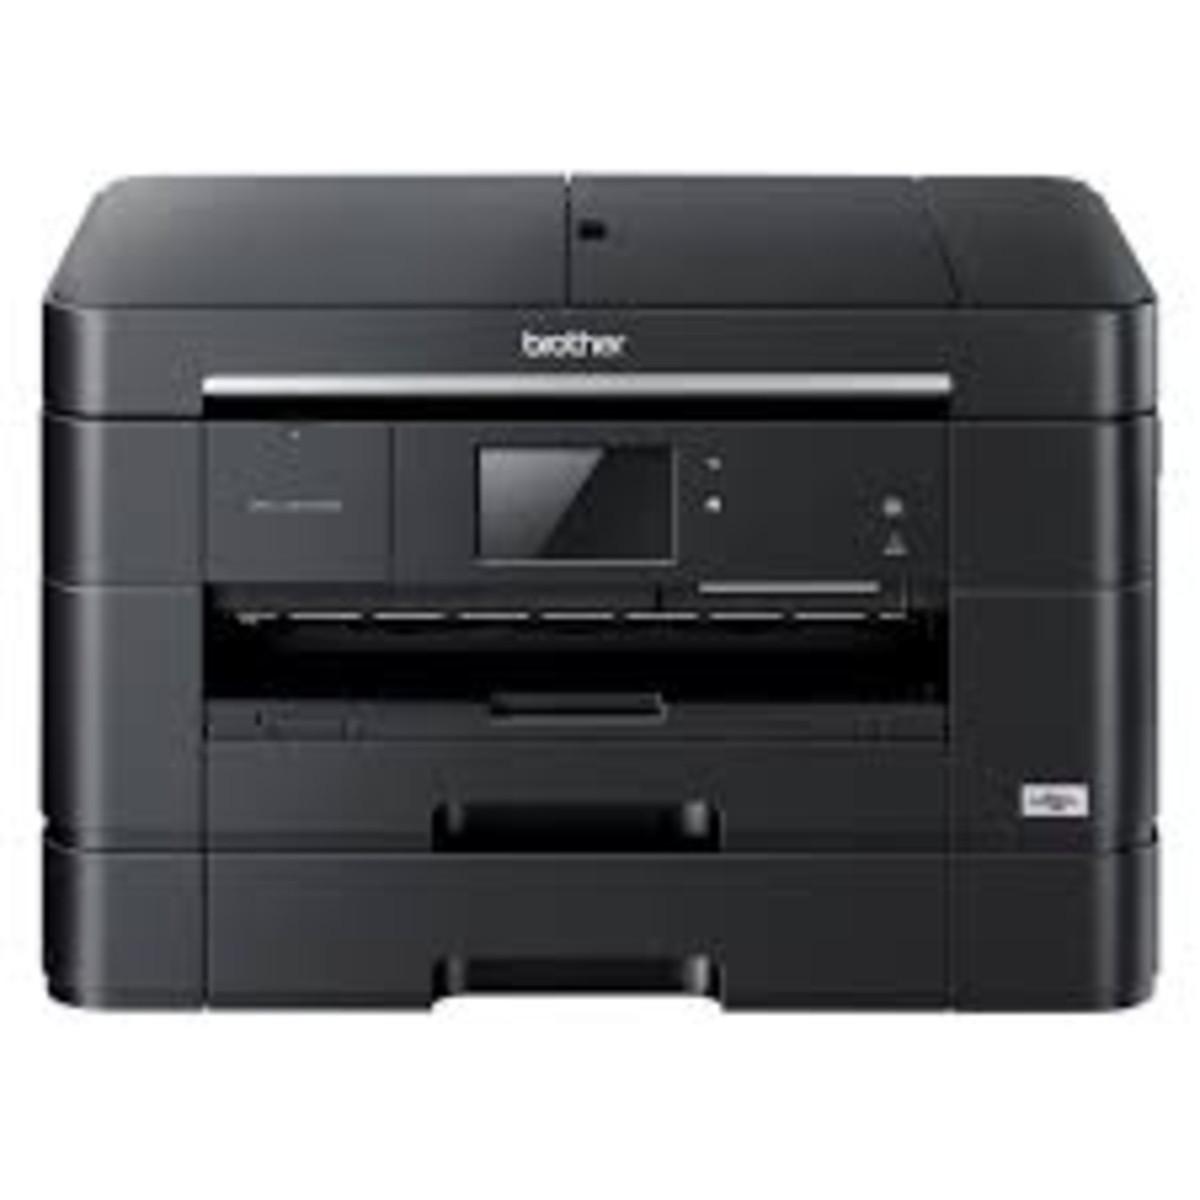 Brother MFC-J5720DW Inkjet Printer